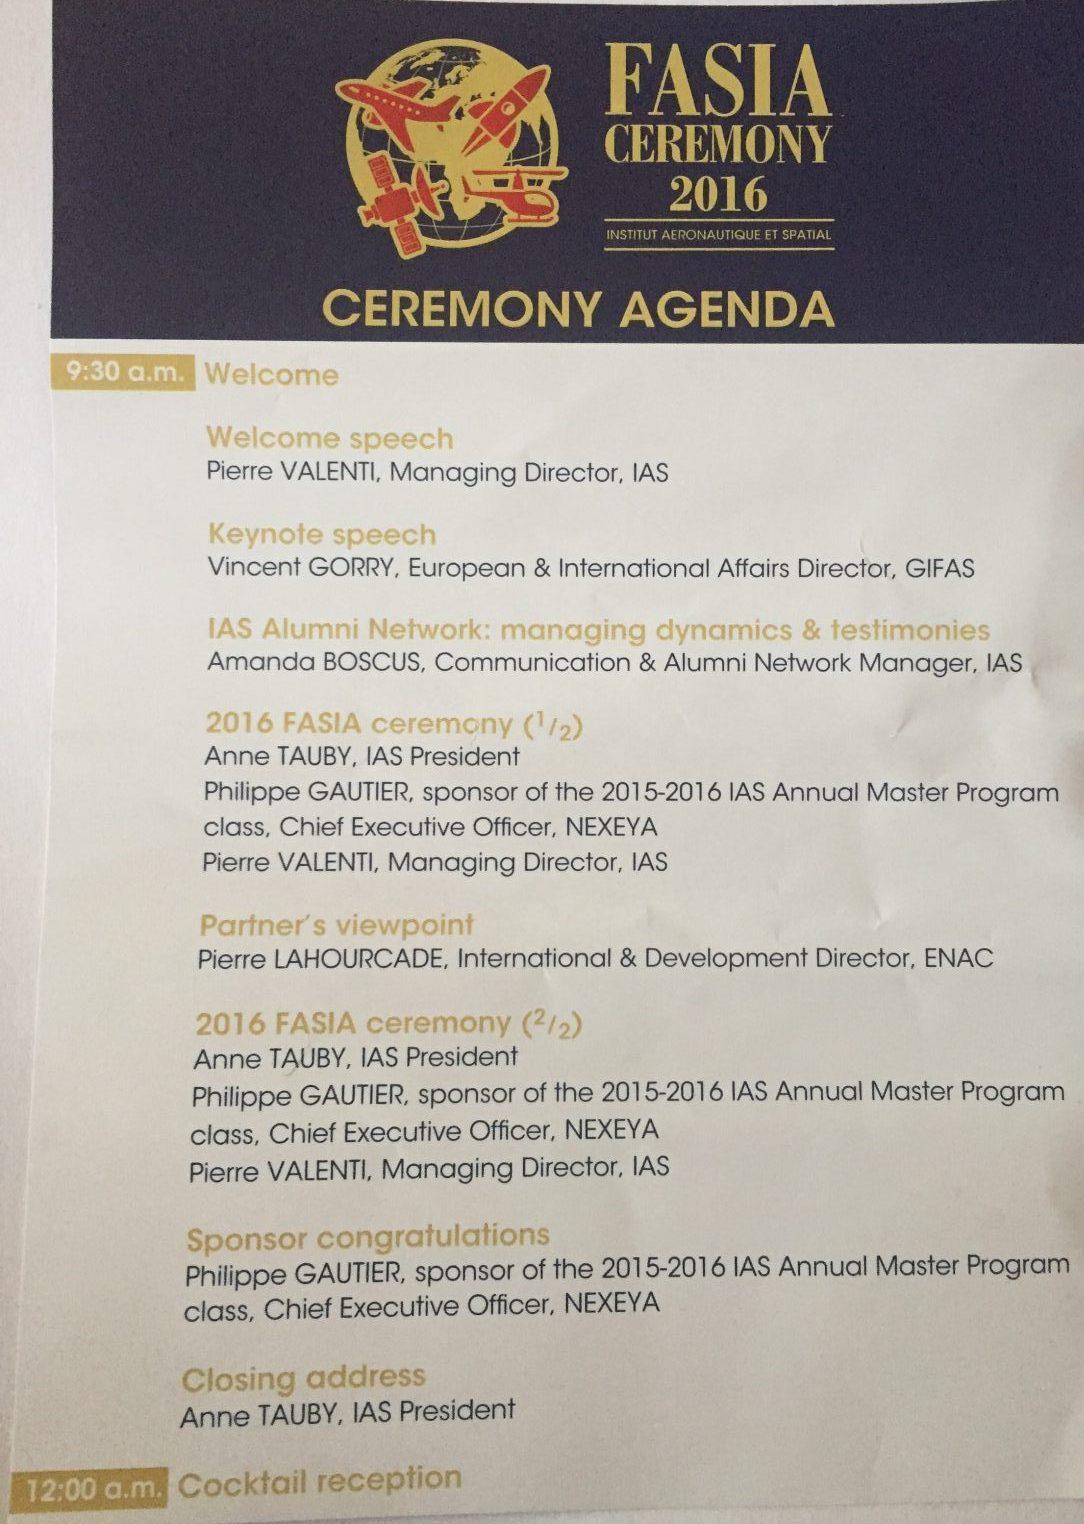 FASIA Ceremony Agenda